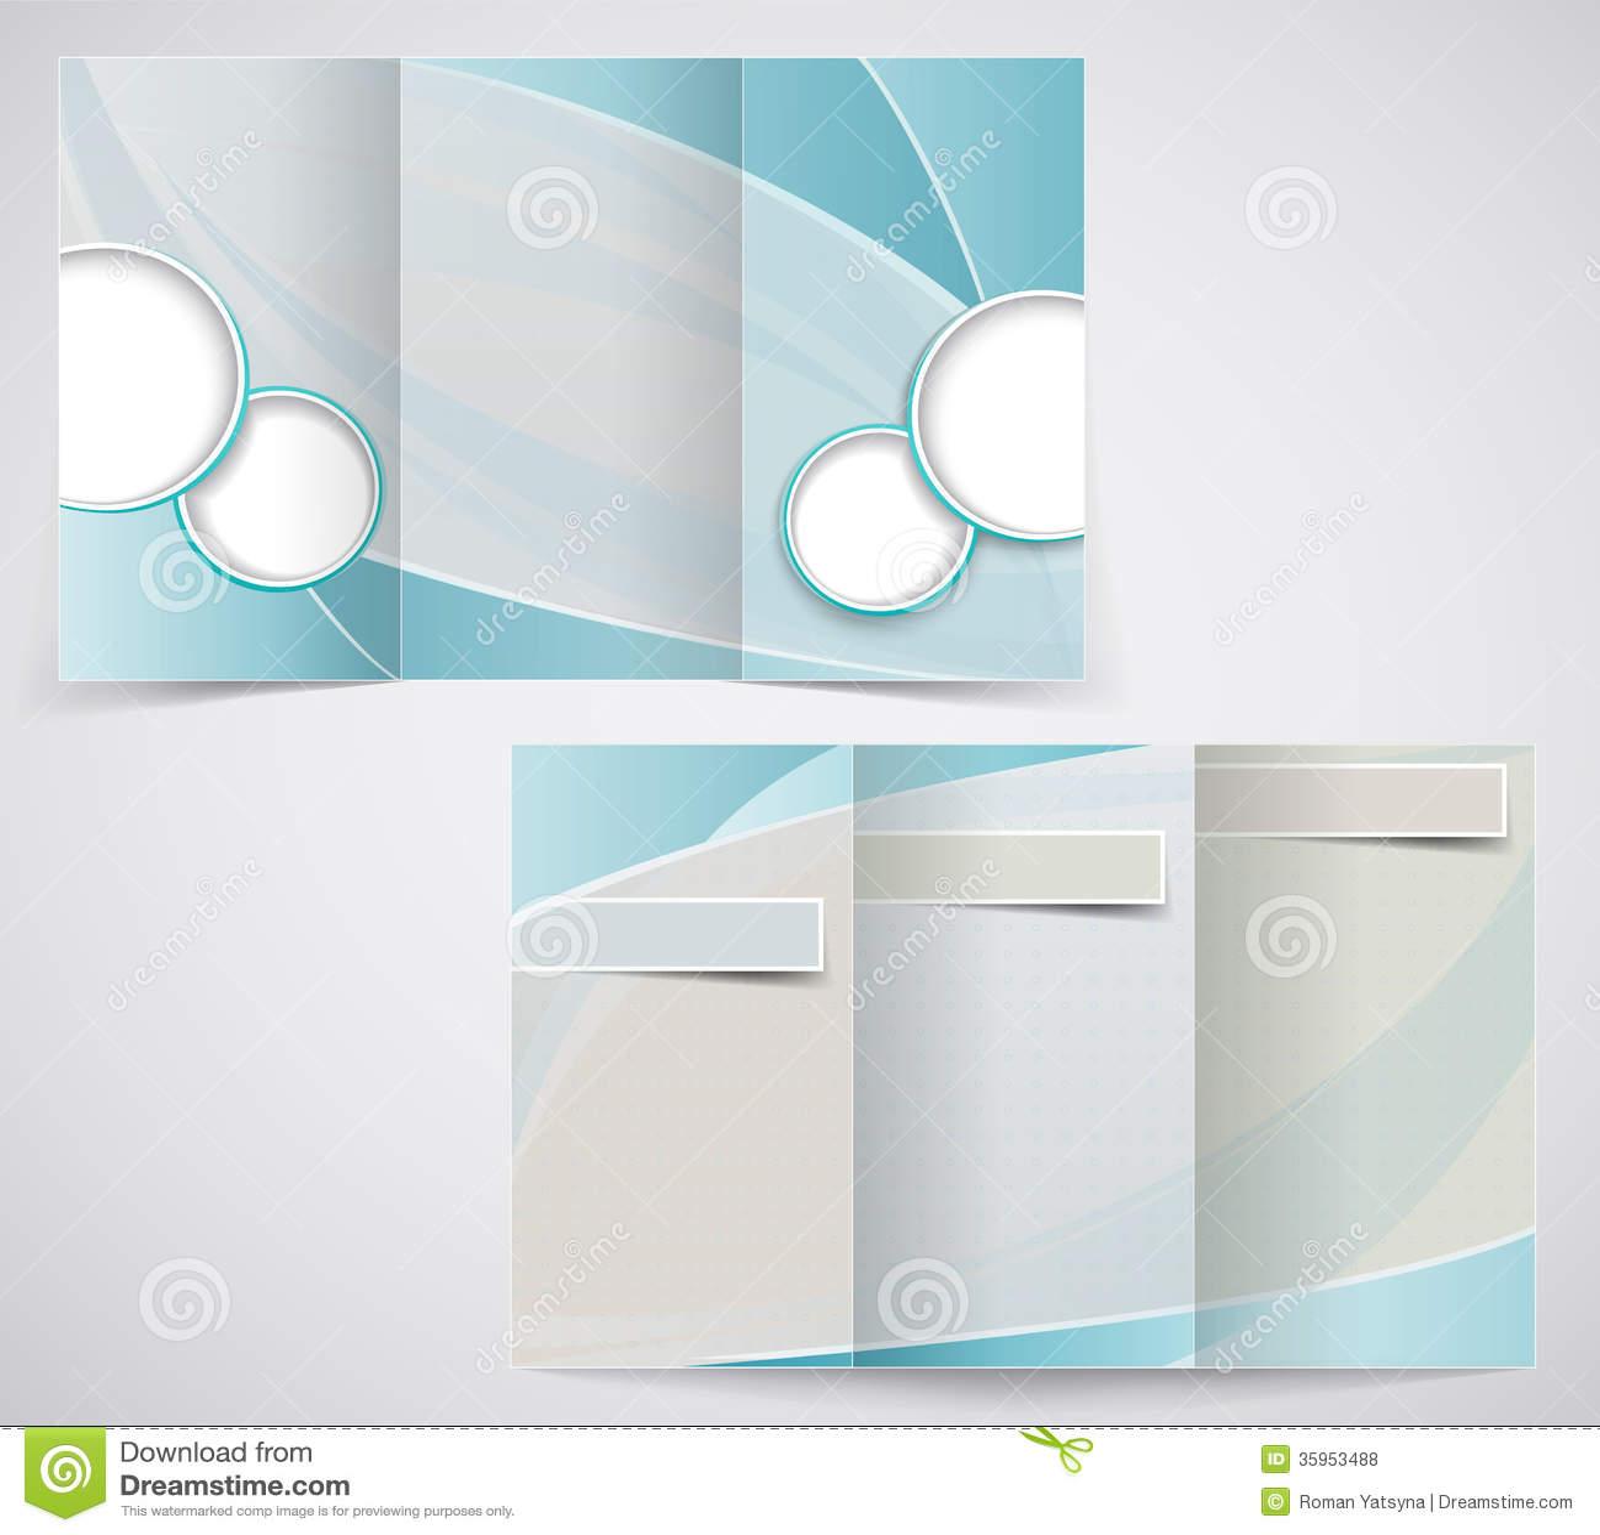 Tri Fold Business Brochure Template Vector Blue D Royalty